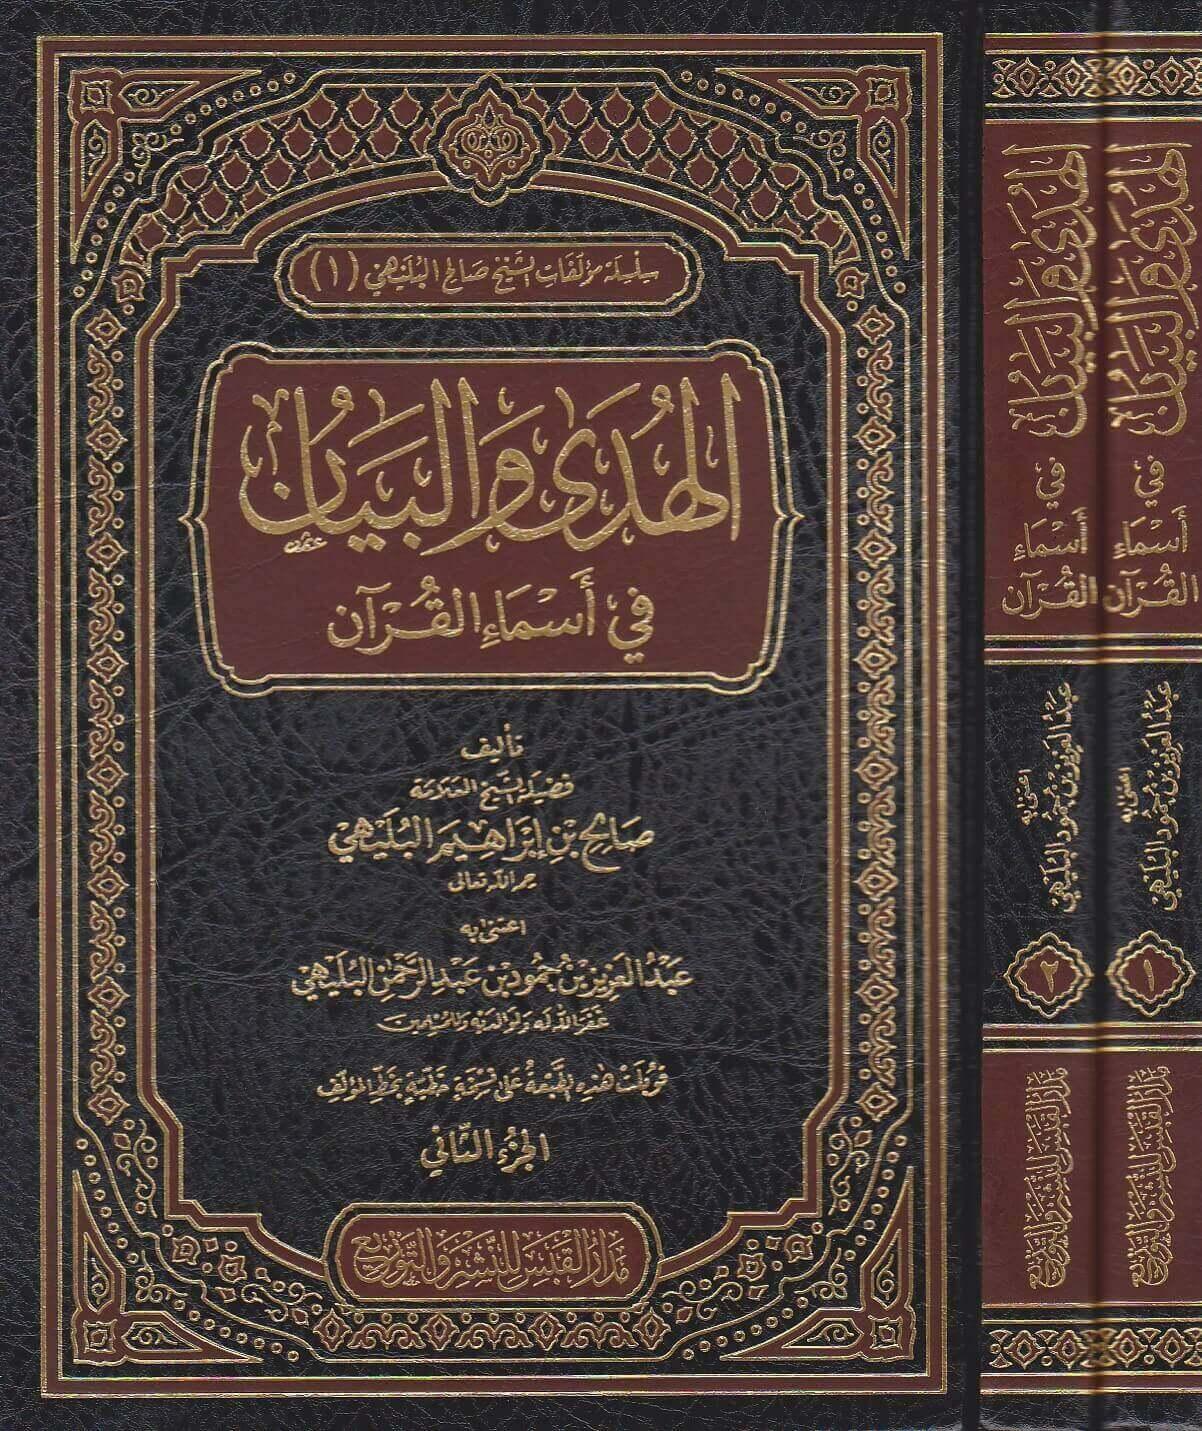 Photo of تحميل كتاب الهدى والبيان في معرفة أسماء القرآن pdf